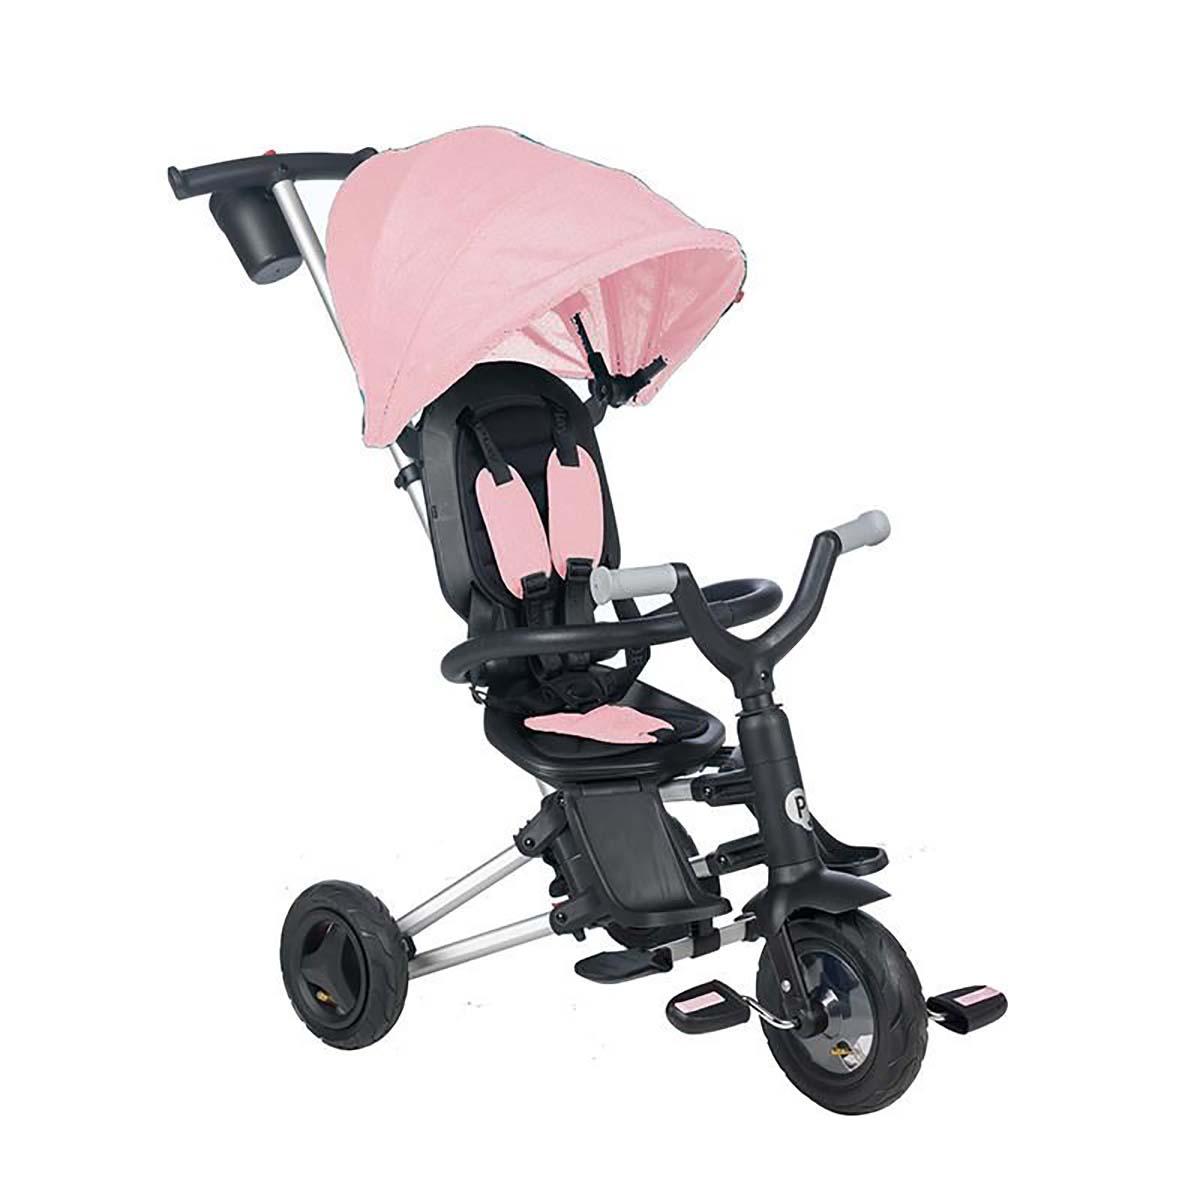 Tricicleta ultrapliabila Qplay Nova, Roz